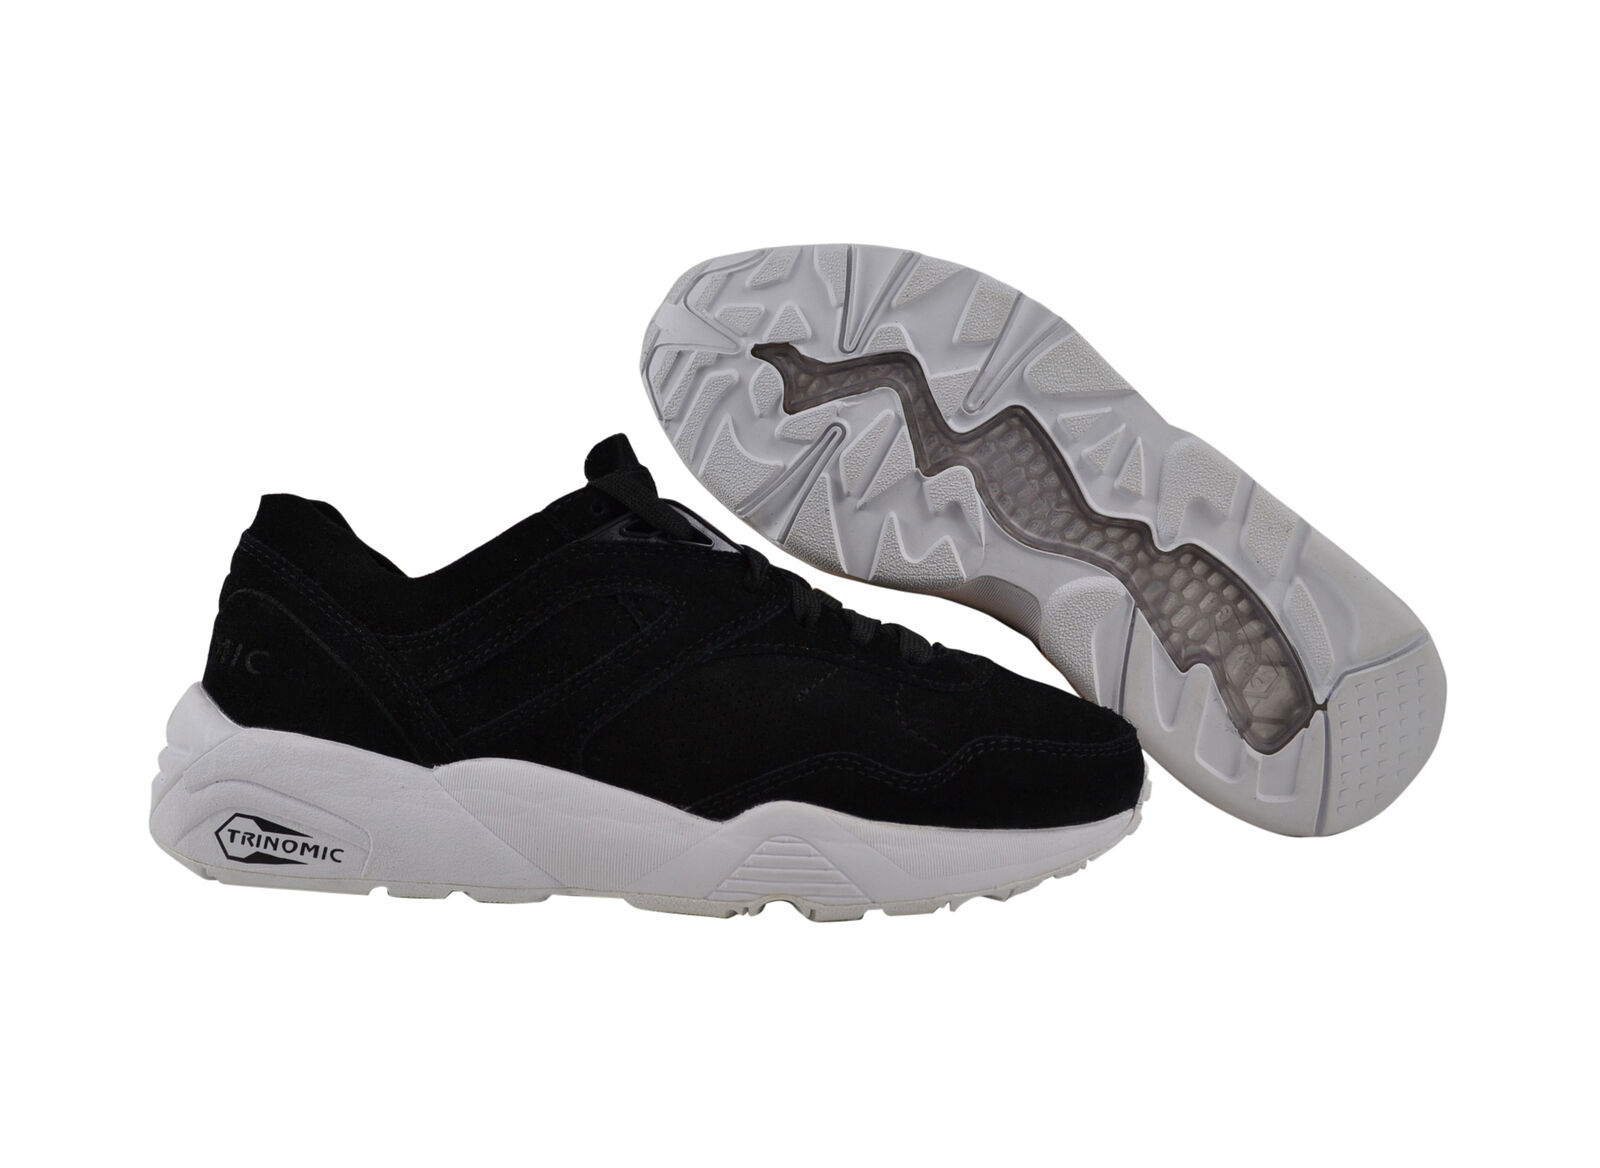 Puma R698 SOFT black/puma silver/white Sneaker/Schuhe schwarz